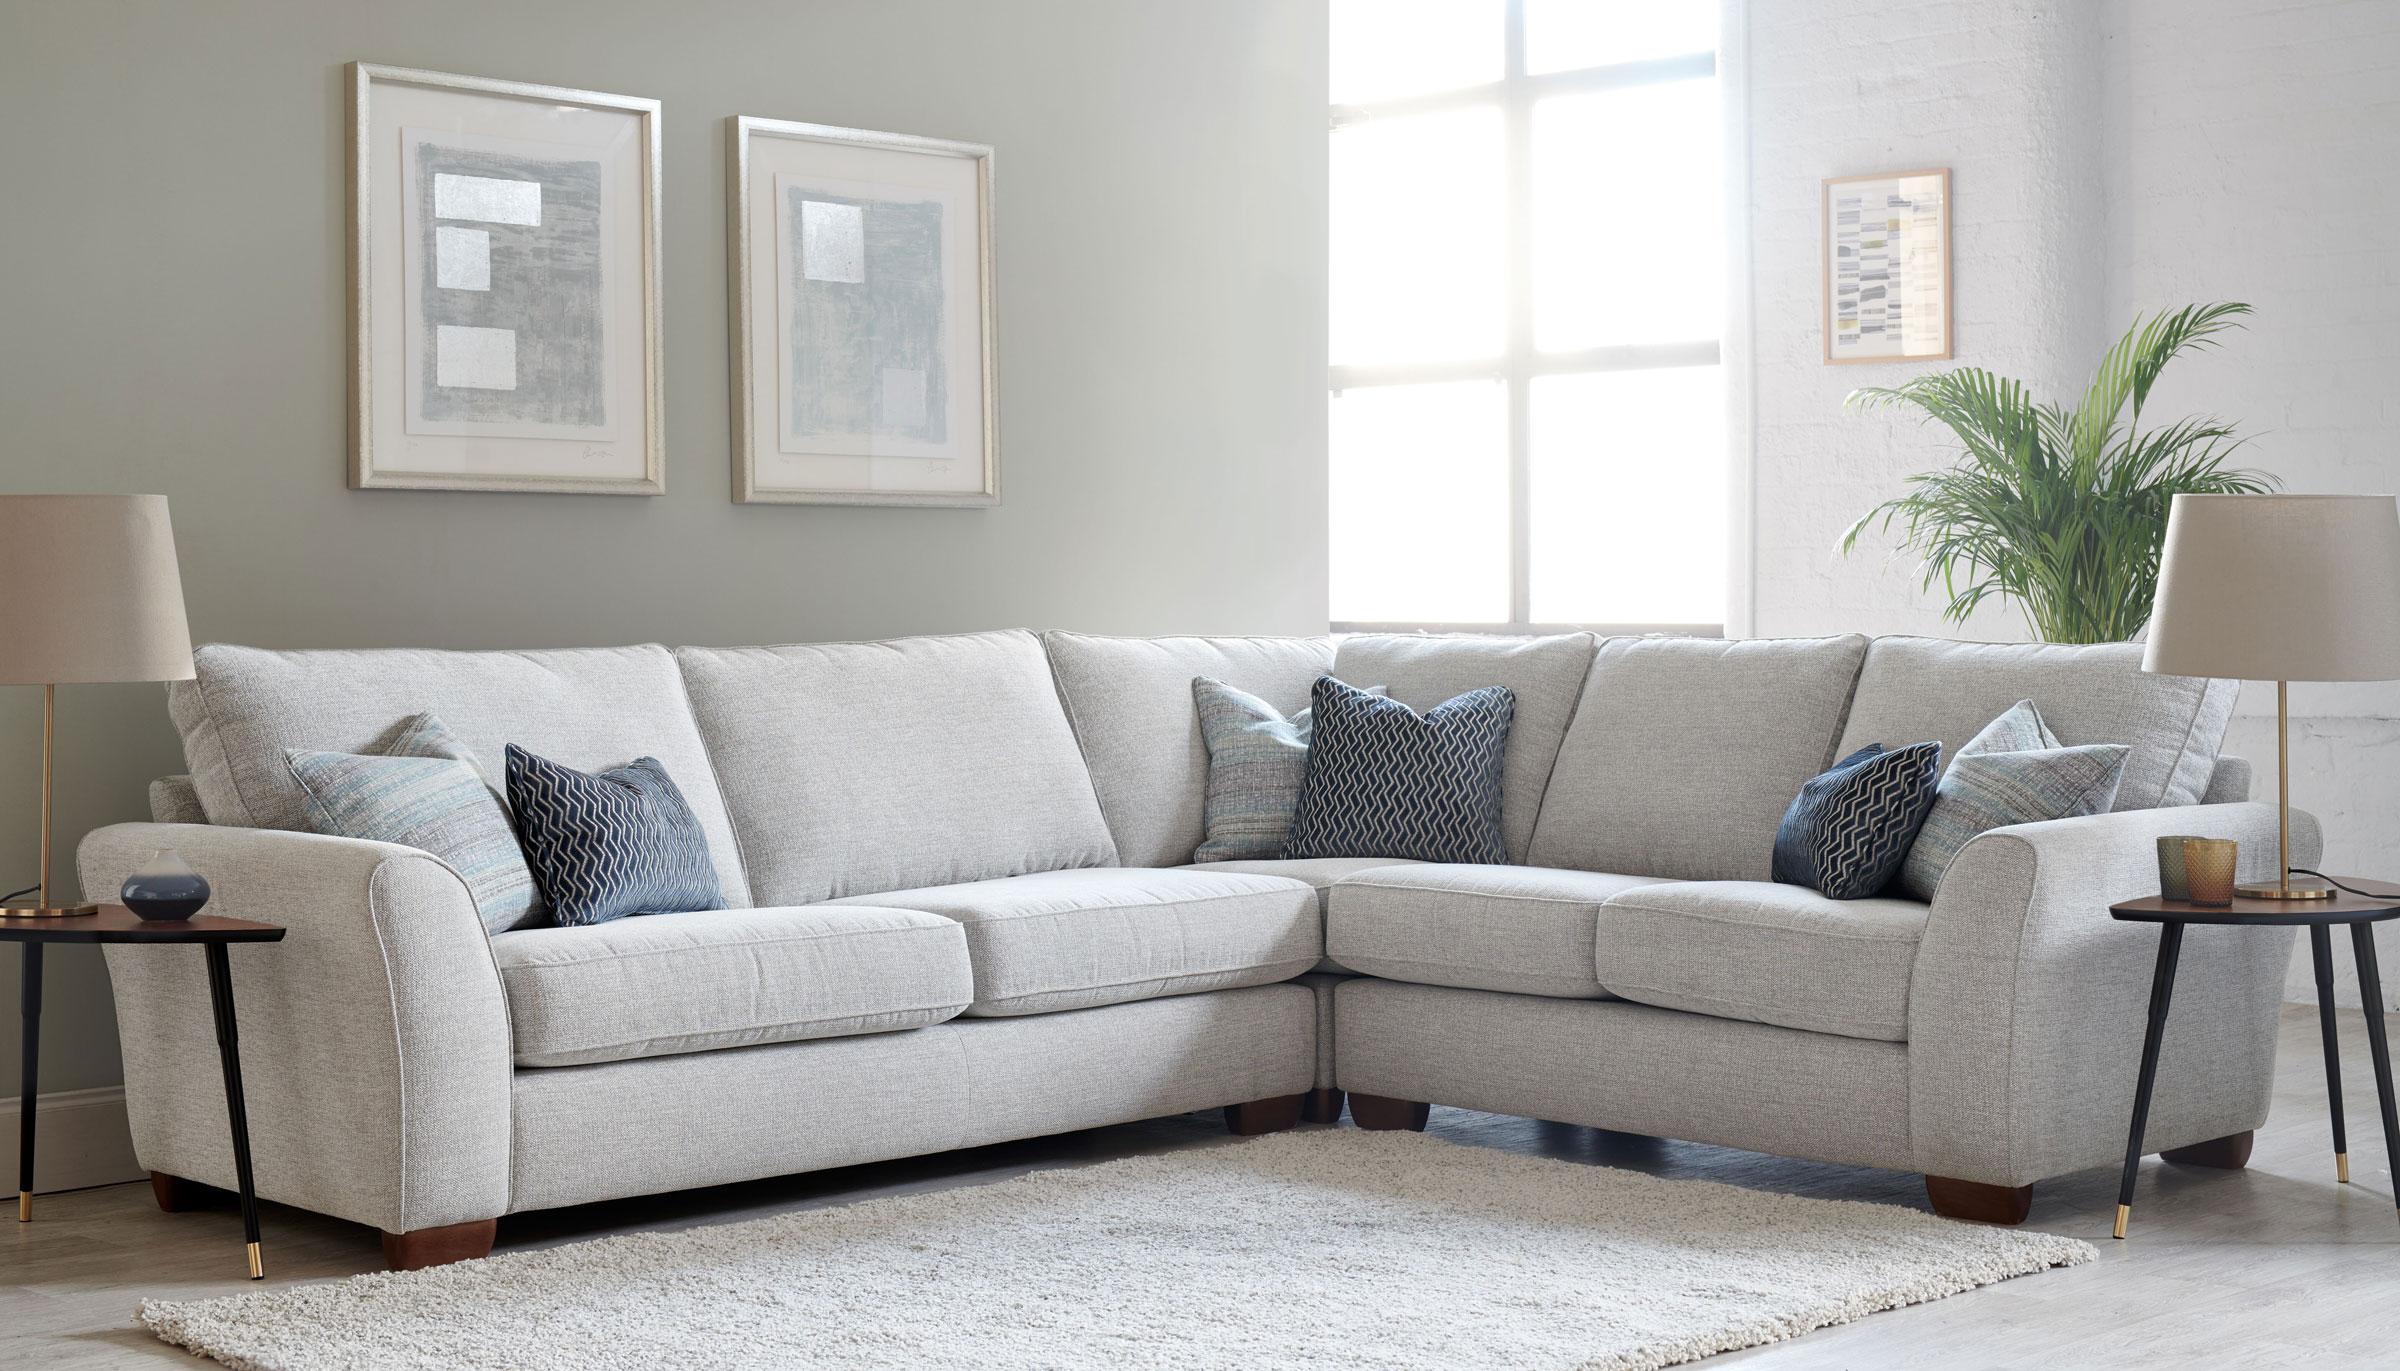 Salcombe Corner Sofa Collection